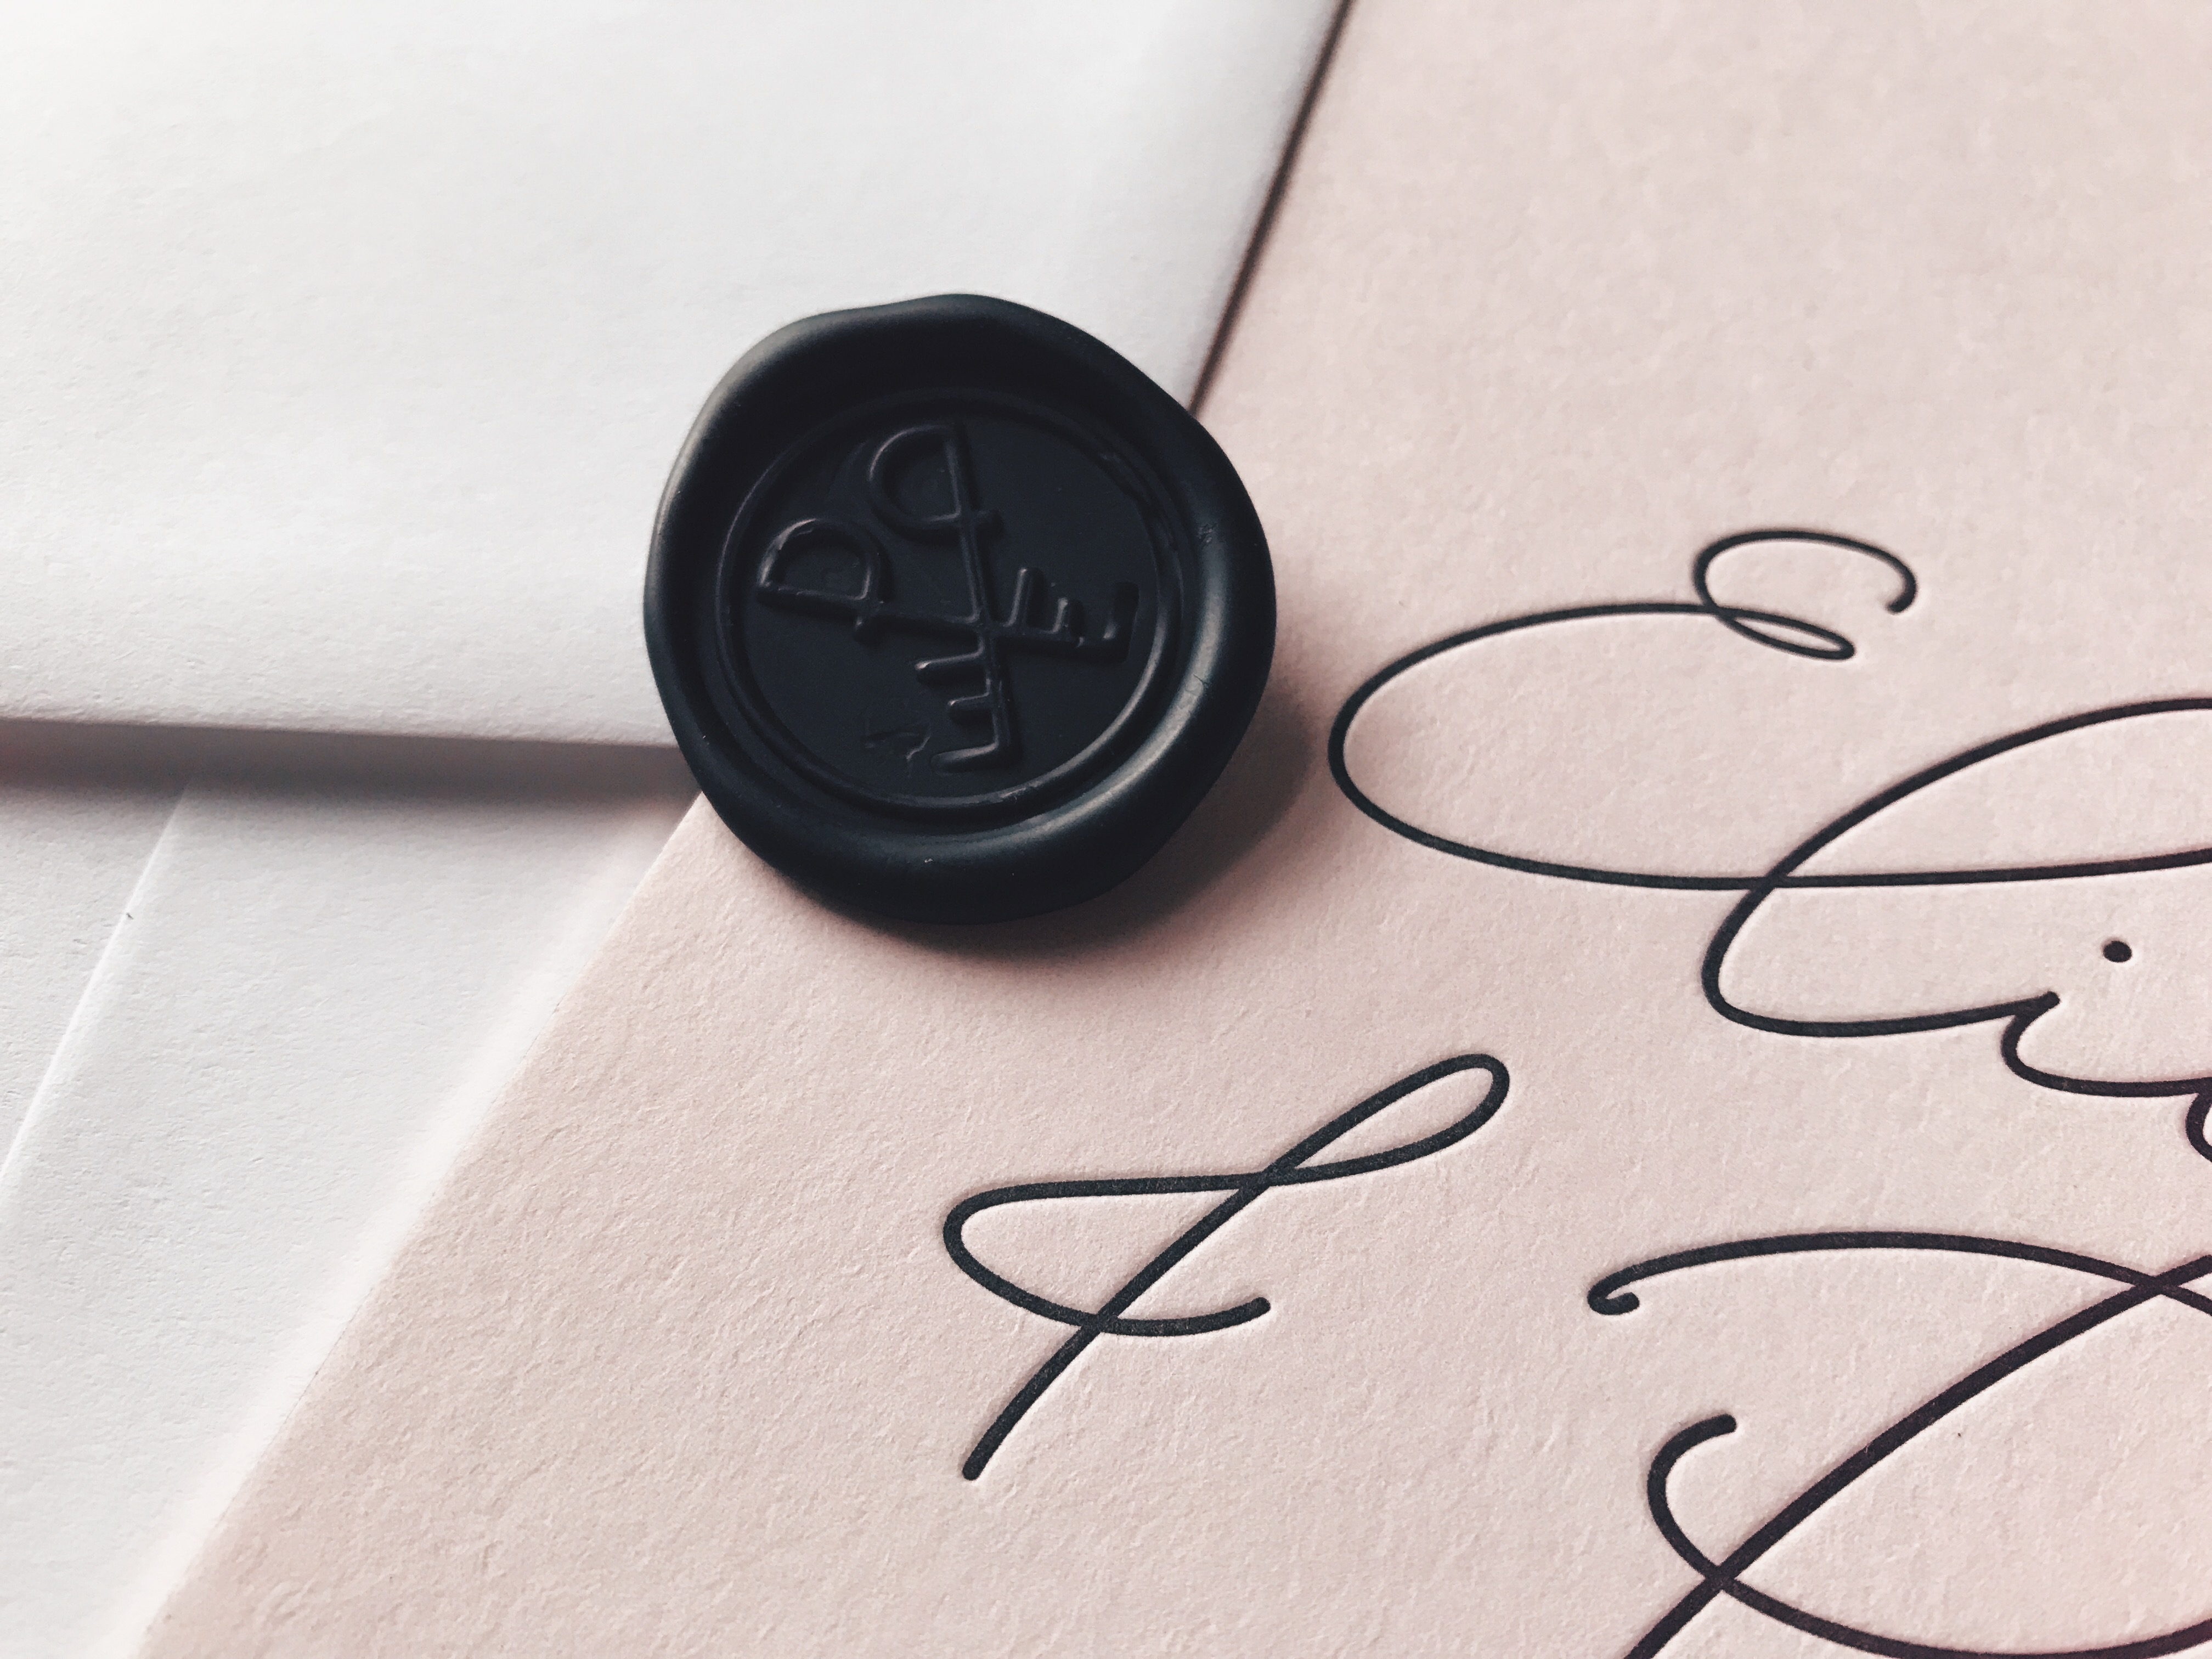 lakzegel huwelijksuitnodigingen zwart black seal wedding stationery letterpress